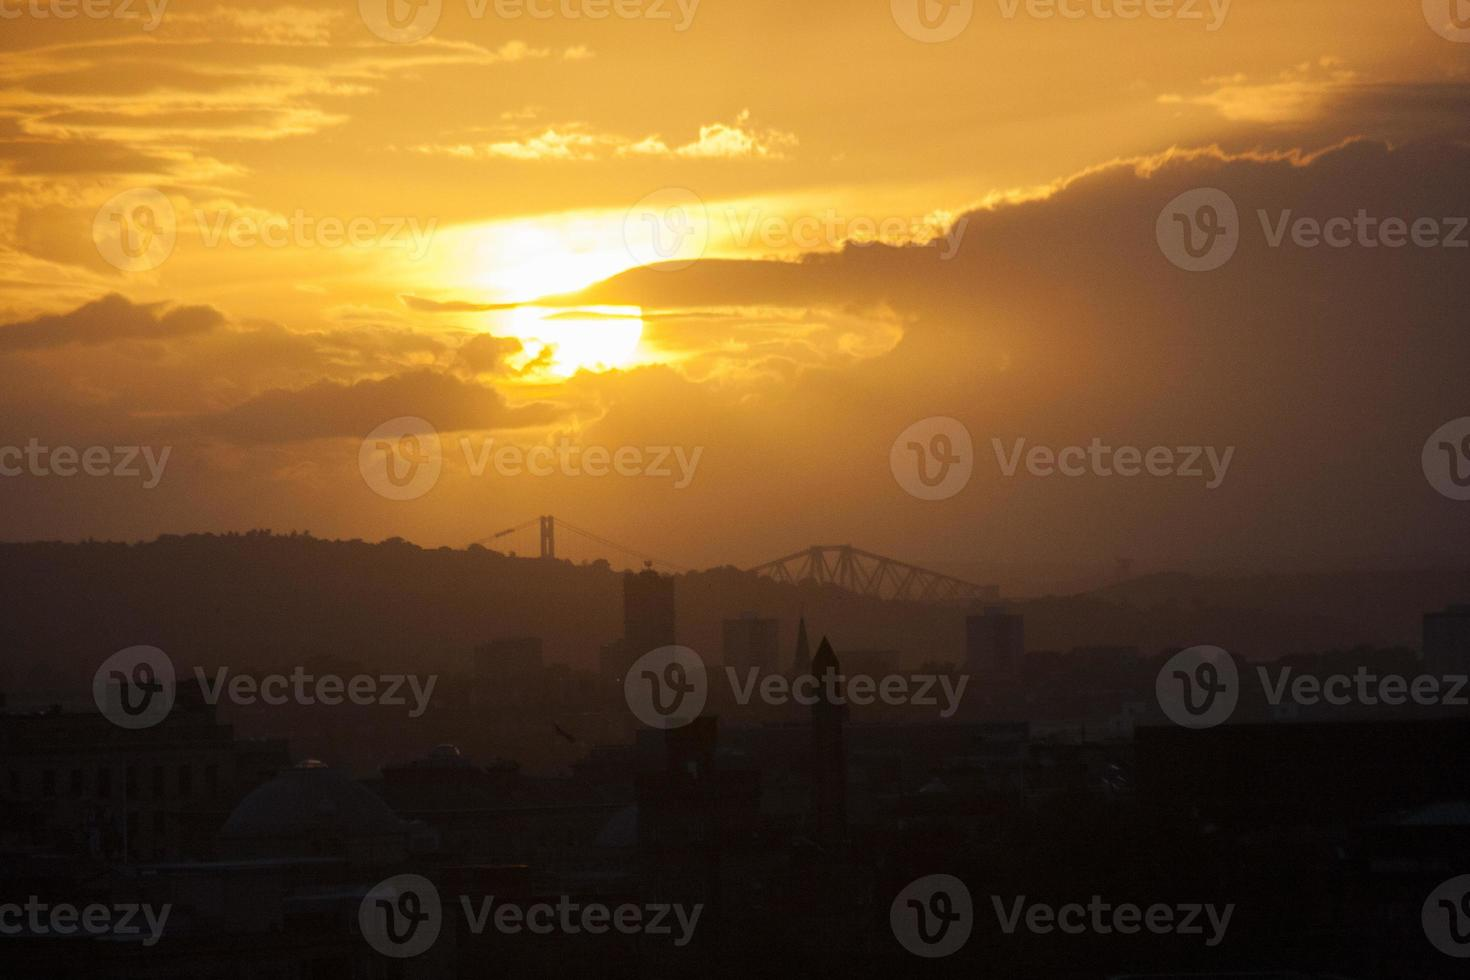 Scotland - Edinburgh city centre Sunset photo